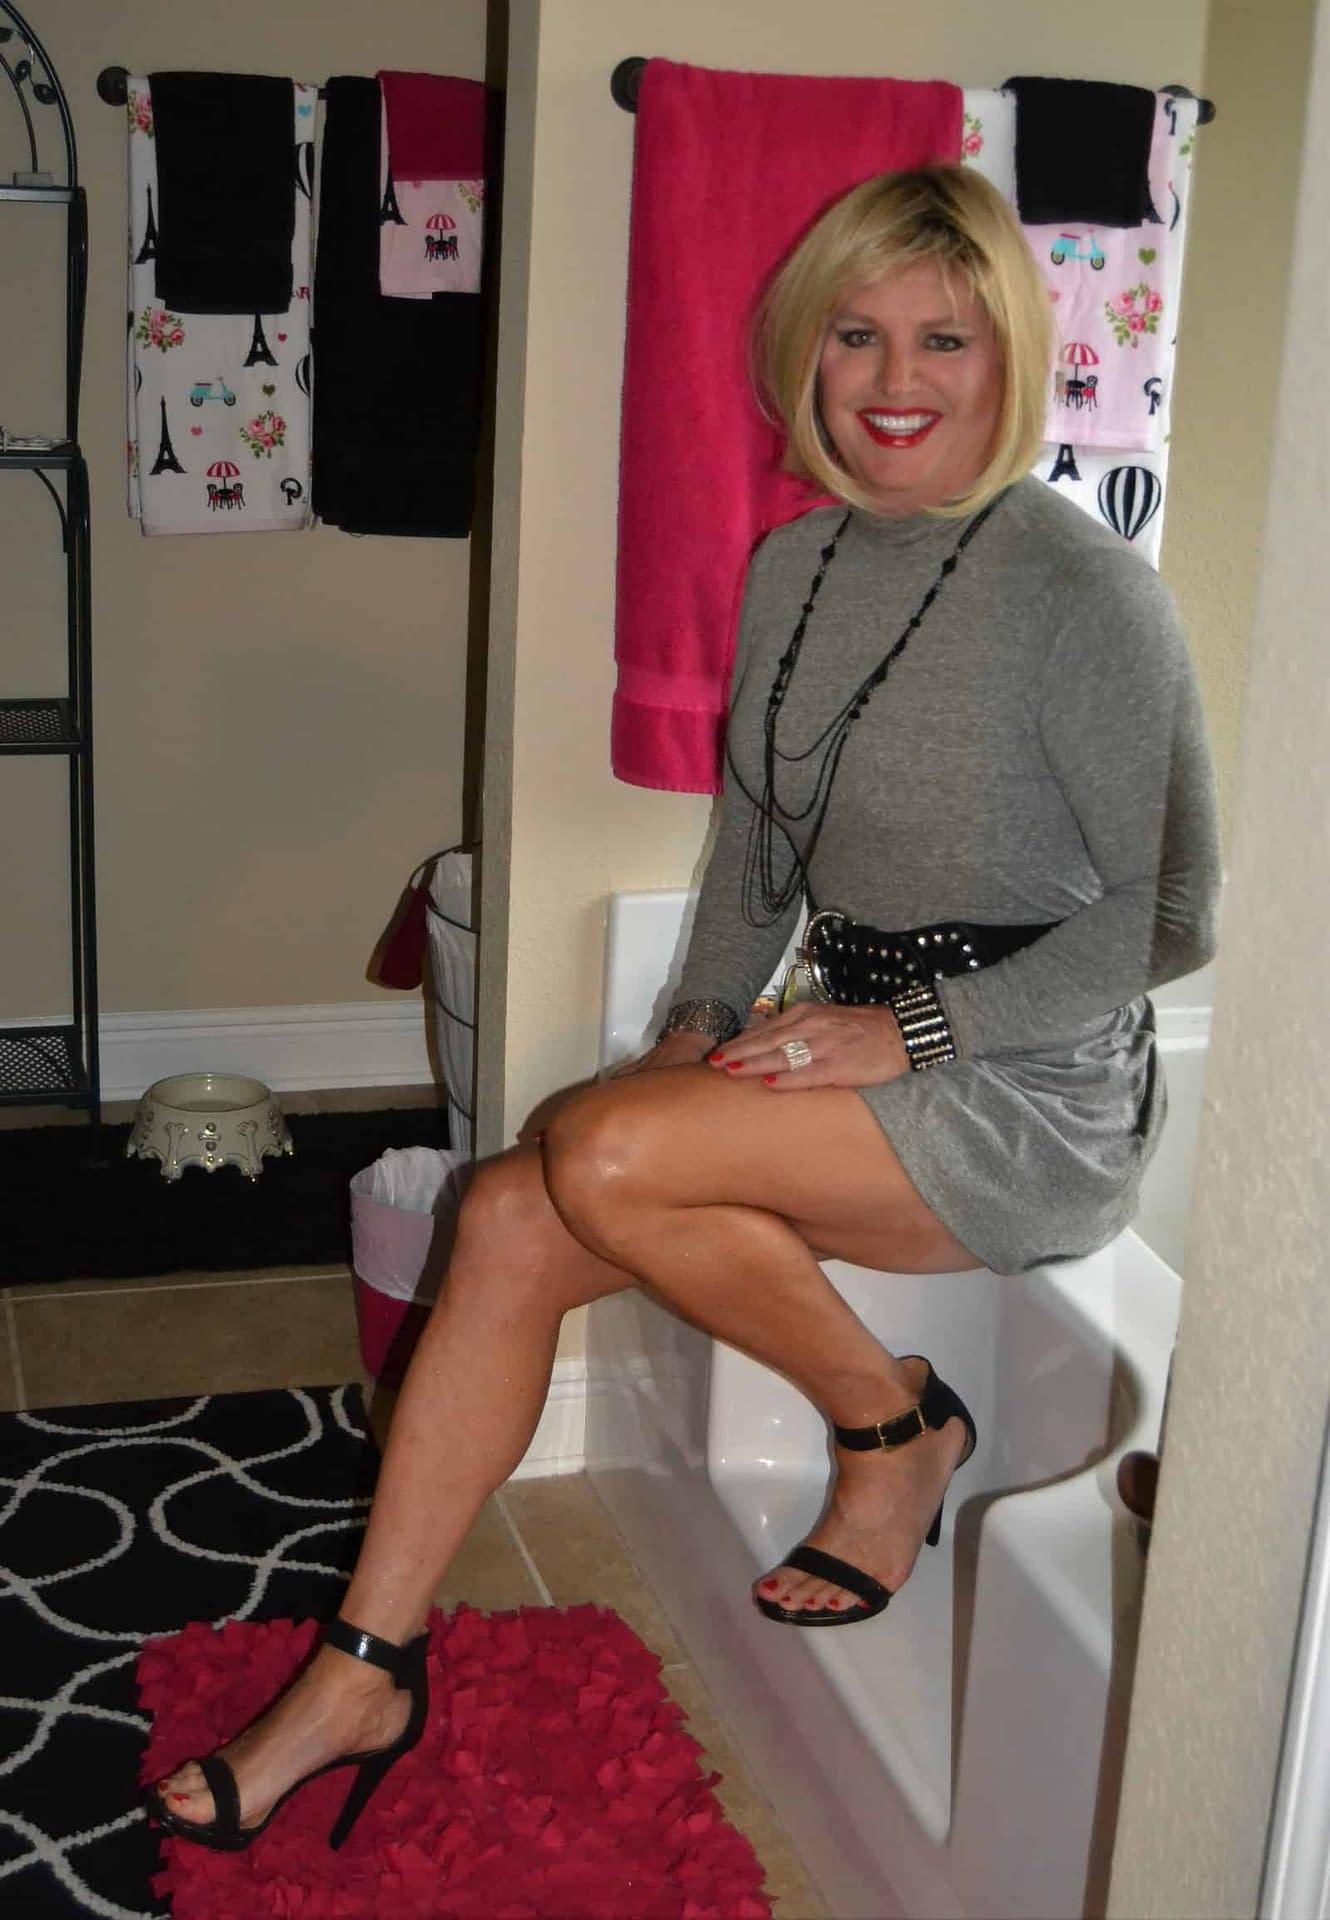 Rub a dub dub, there's a blonde on the tub!